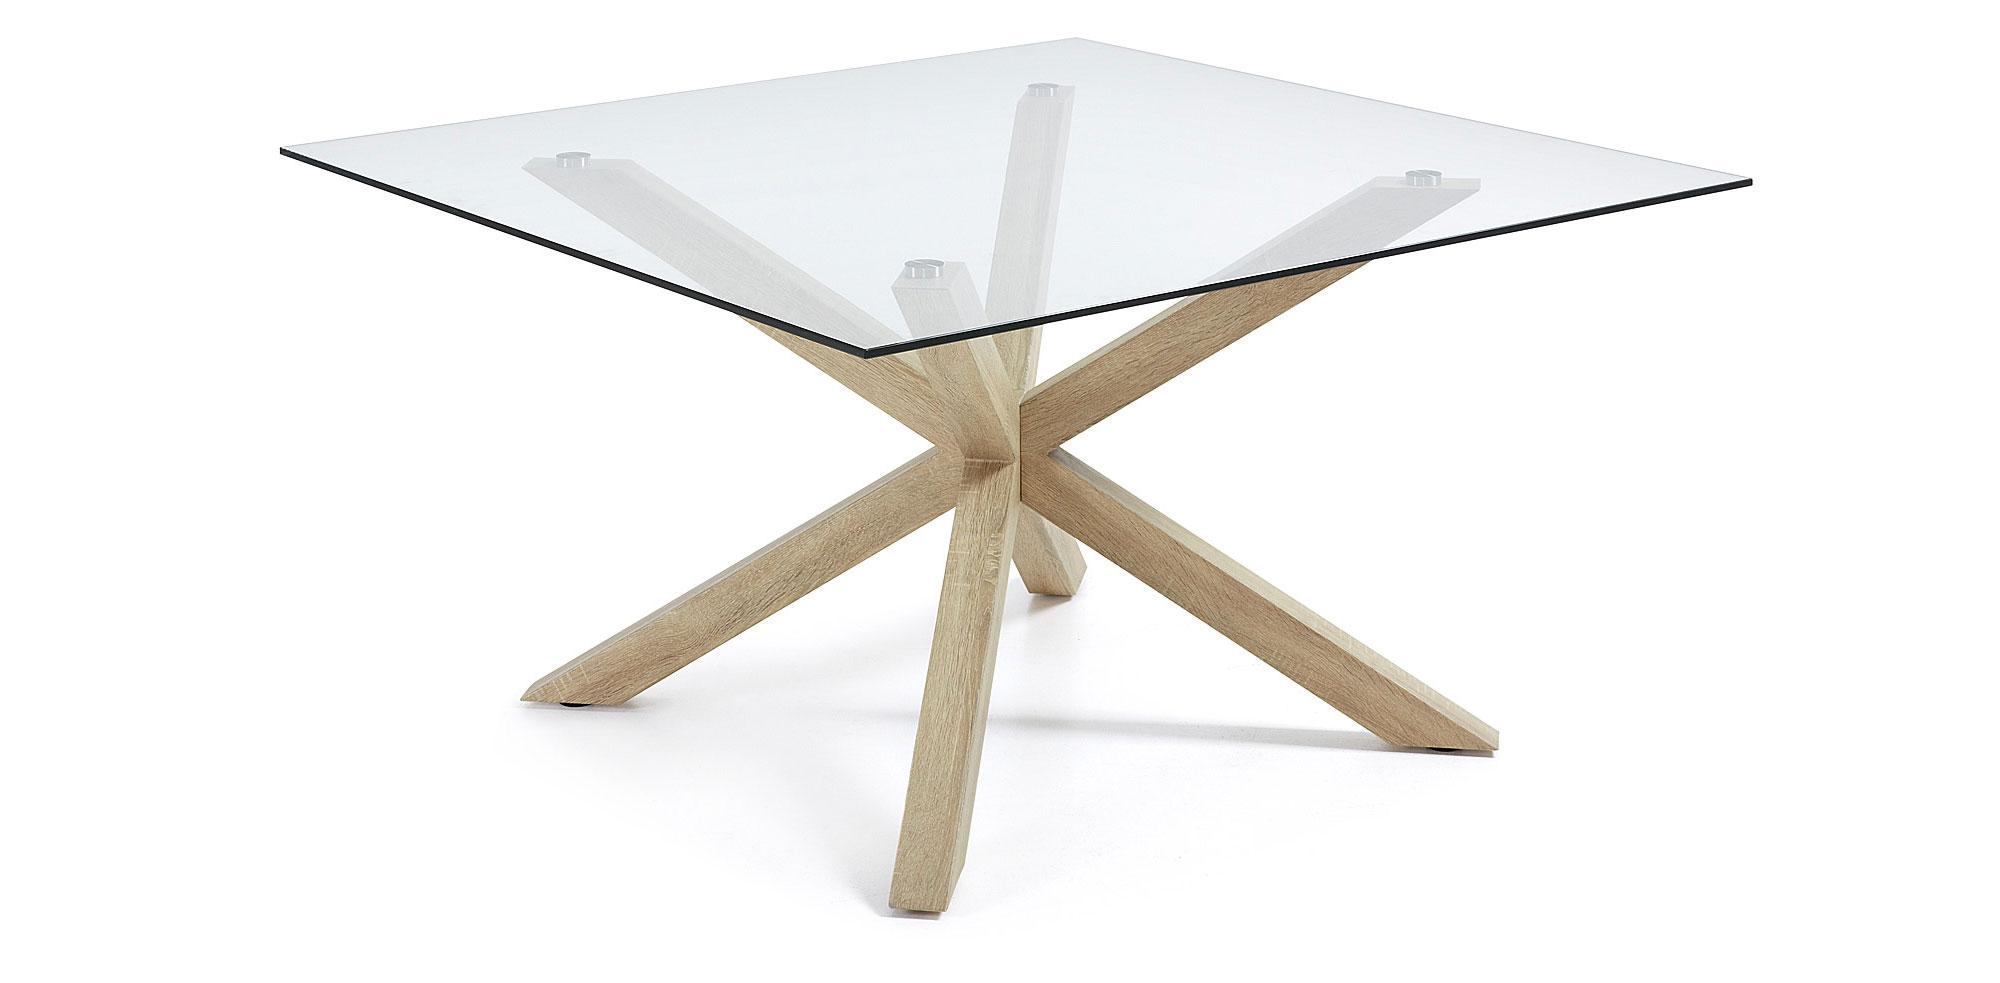 Mesa de comedor cuadrada de cristal moderna arya de lujo for Mesa de comedor cristal y madera